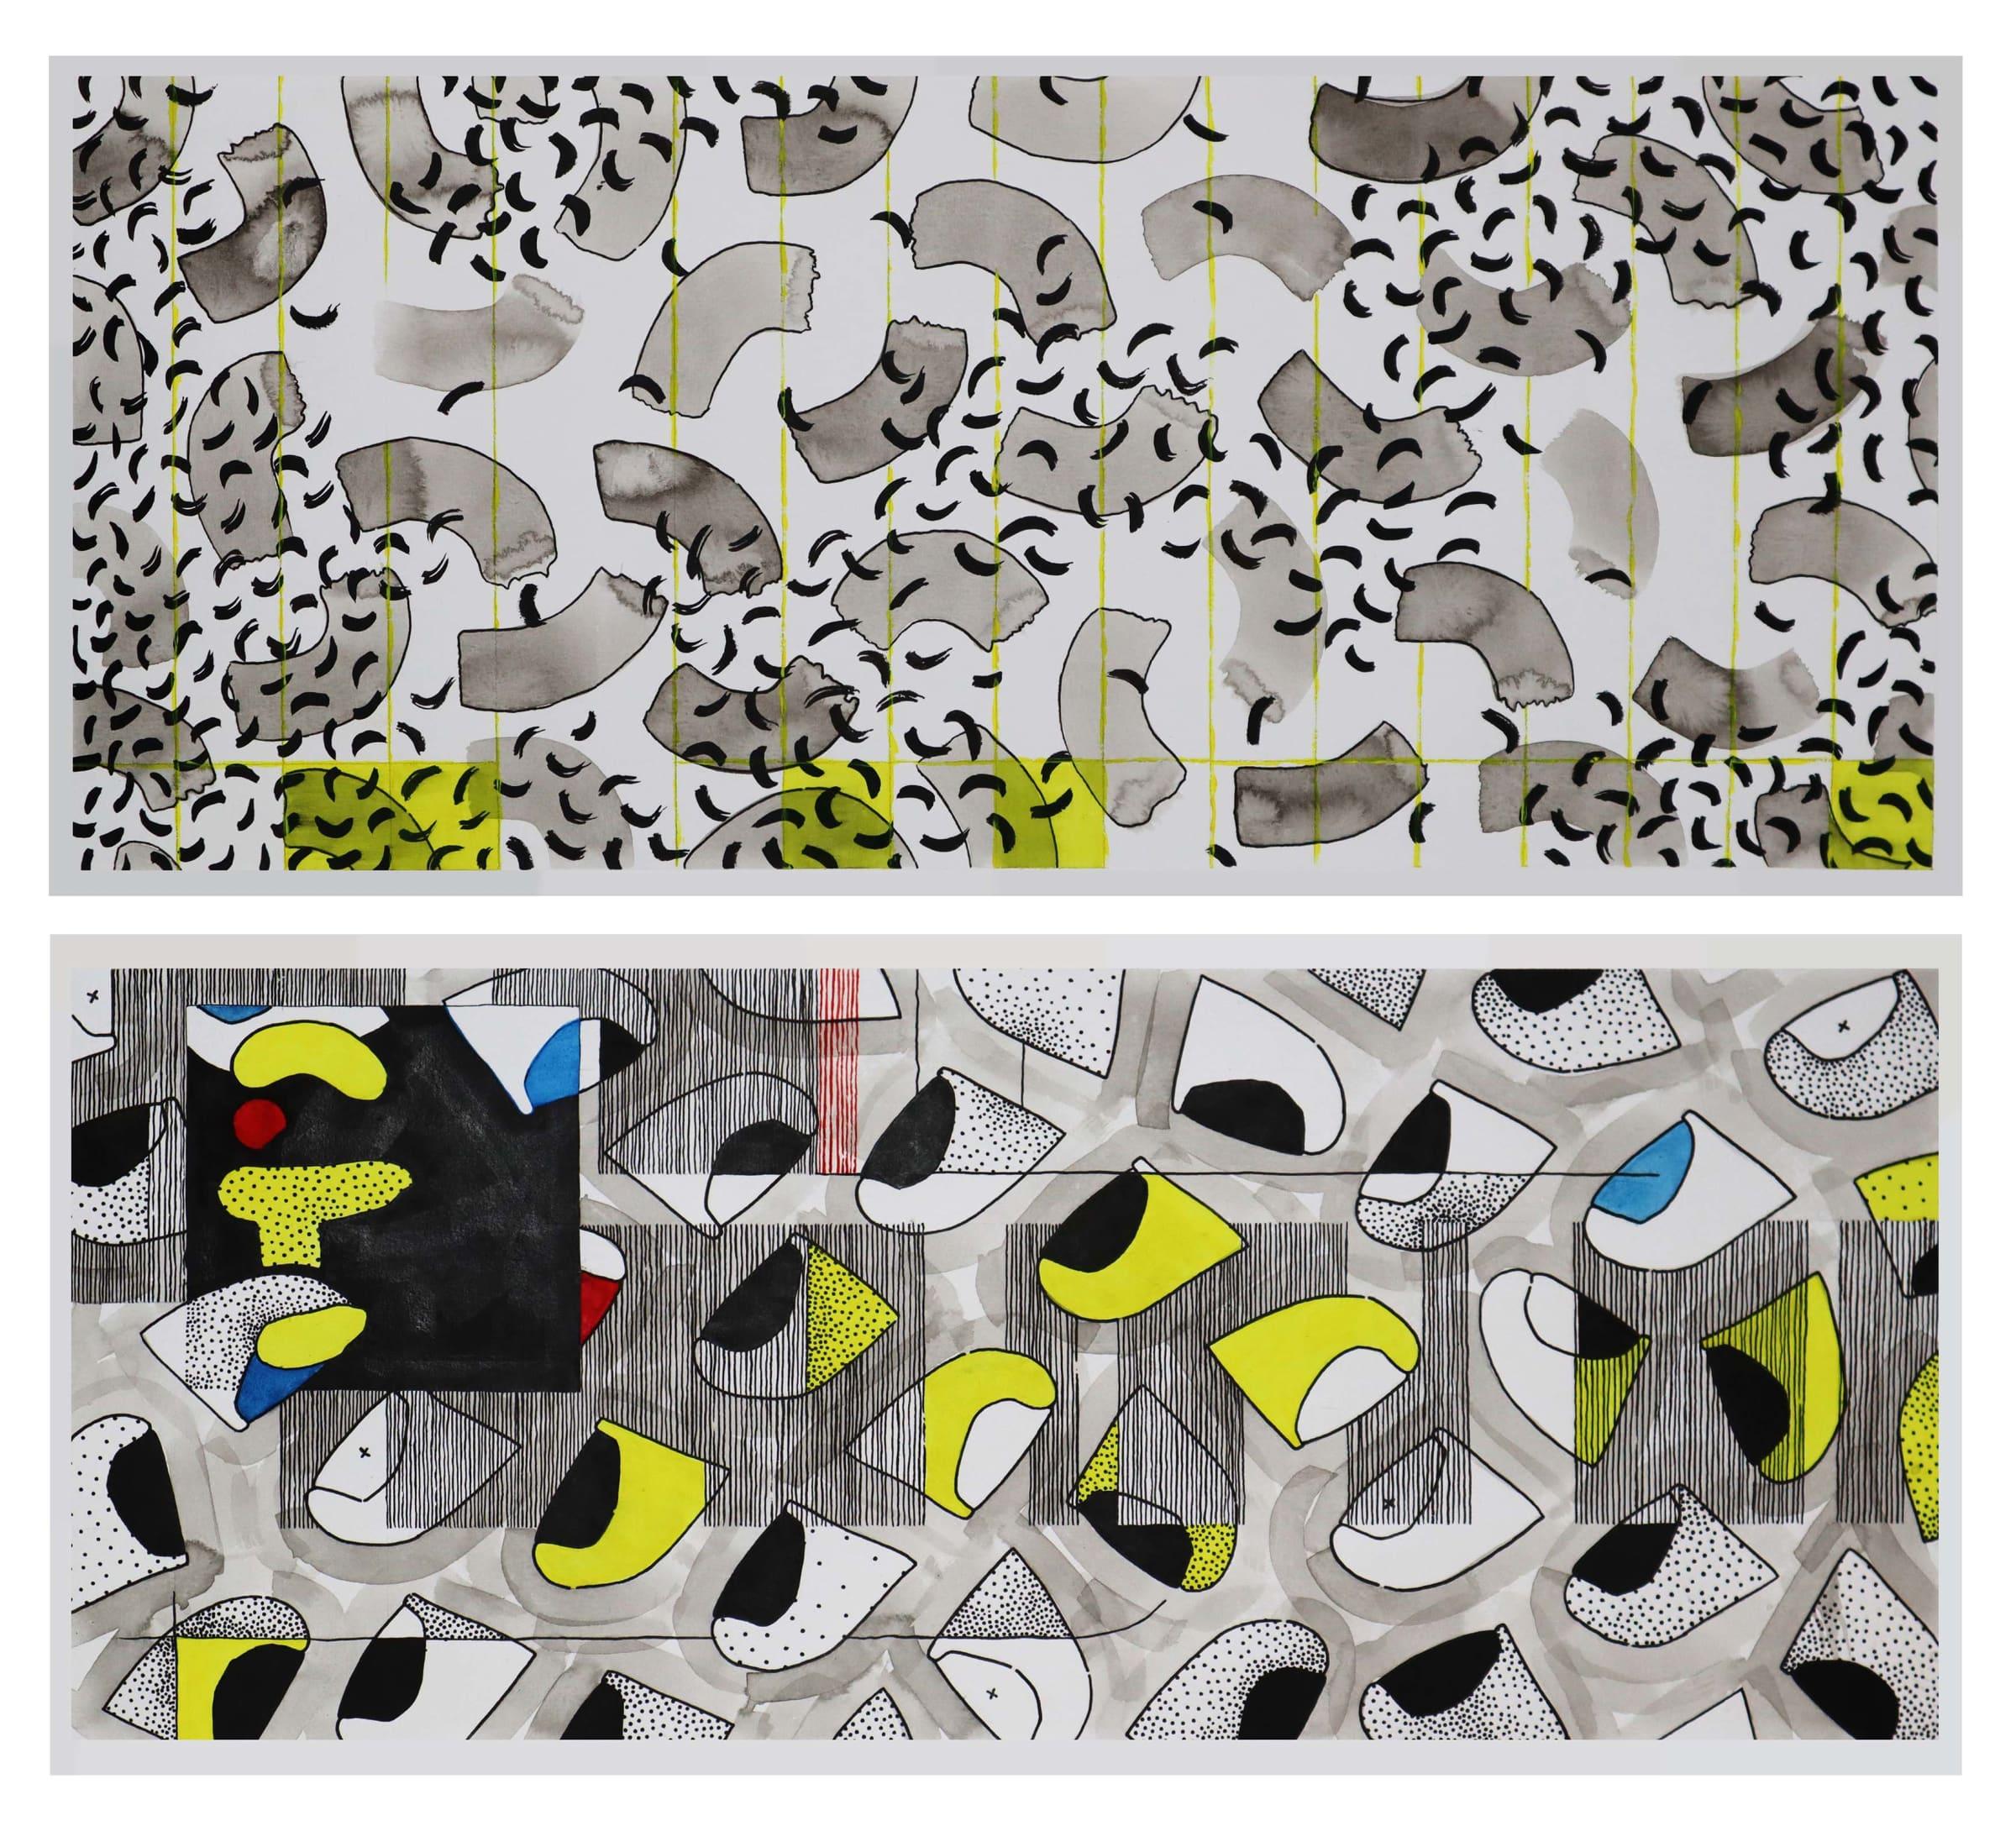 <span class=&#34;link fancybox-details-link&#34;><a href=&#34;/artworks/897-alexandr-vosloo-e-is-for-entered-2018/&#34;>View Detail Page</a></span><div class=&#34;artist&#34;><strong>Alexandré Vosloo</strong></div> <div class=&#34;title&#34;><em>'E' Is For Entered </em>, 2018</div> <div class=&#34;medium&#34;>Ink Drawing On Canson 200Gsm</div> <div class=&#34;dimensions&#34;>43cm x 49cm</div>